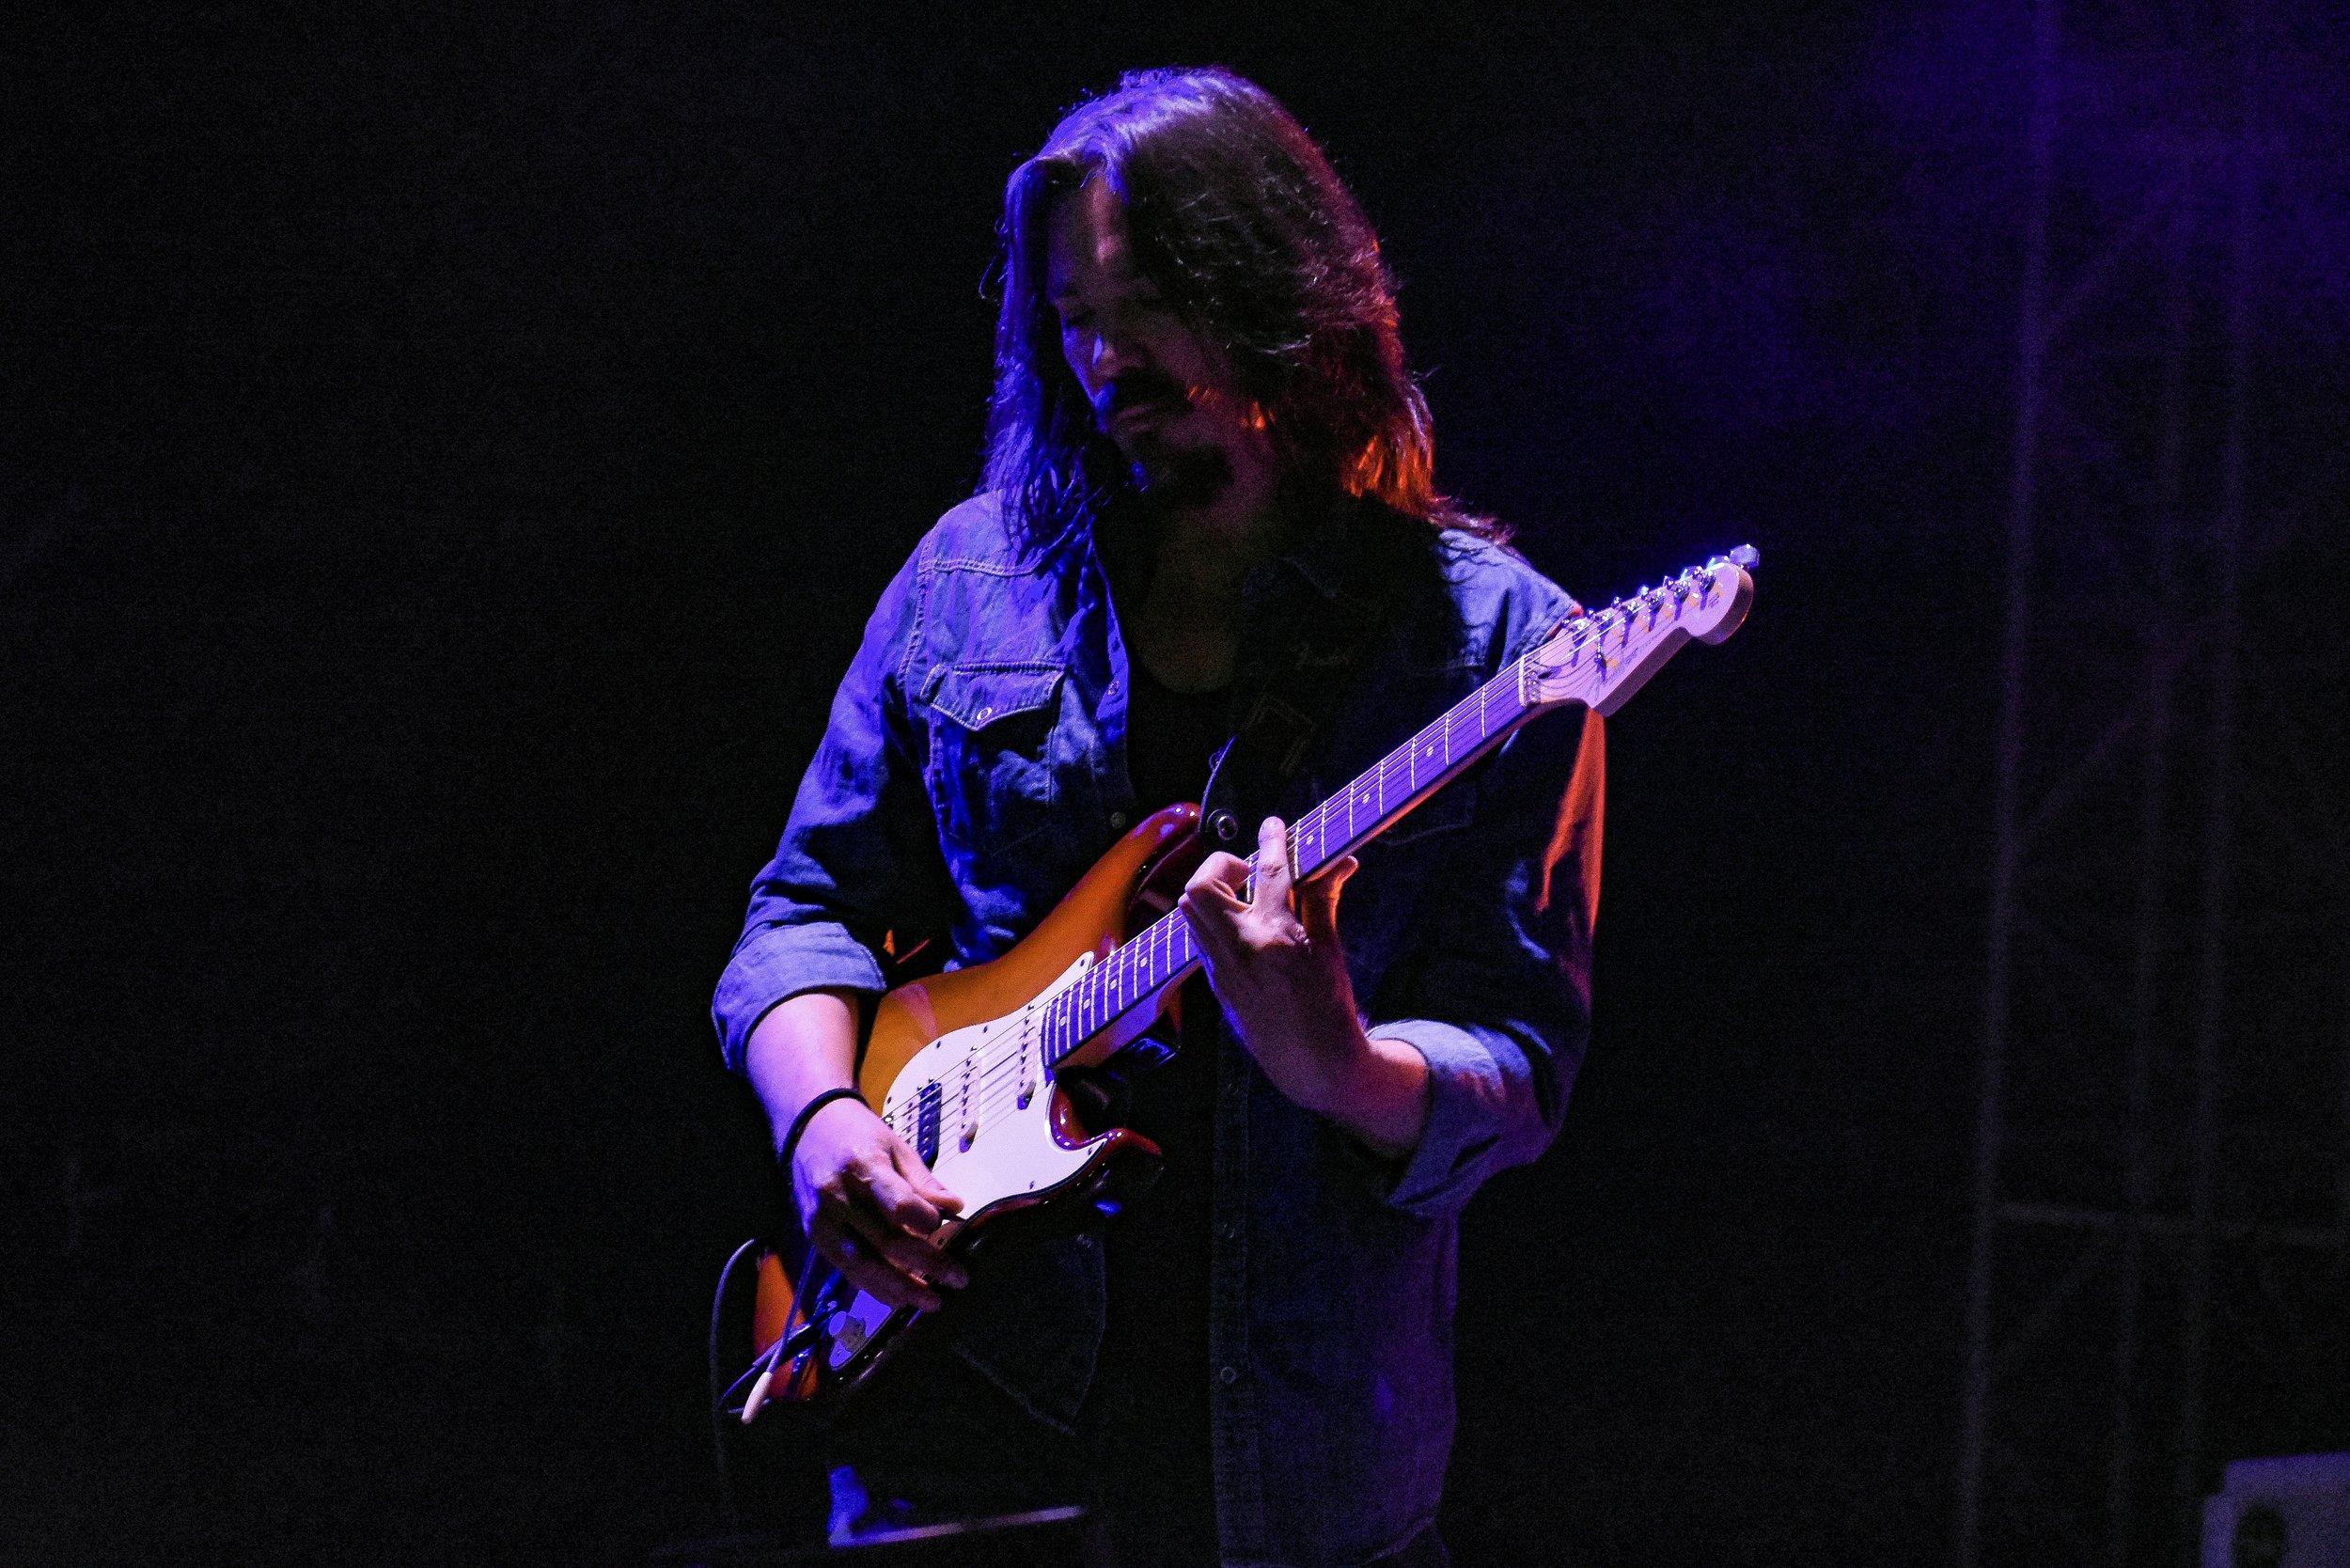 Caifanes guitarra.jpg